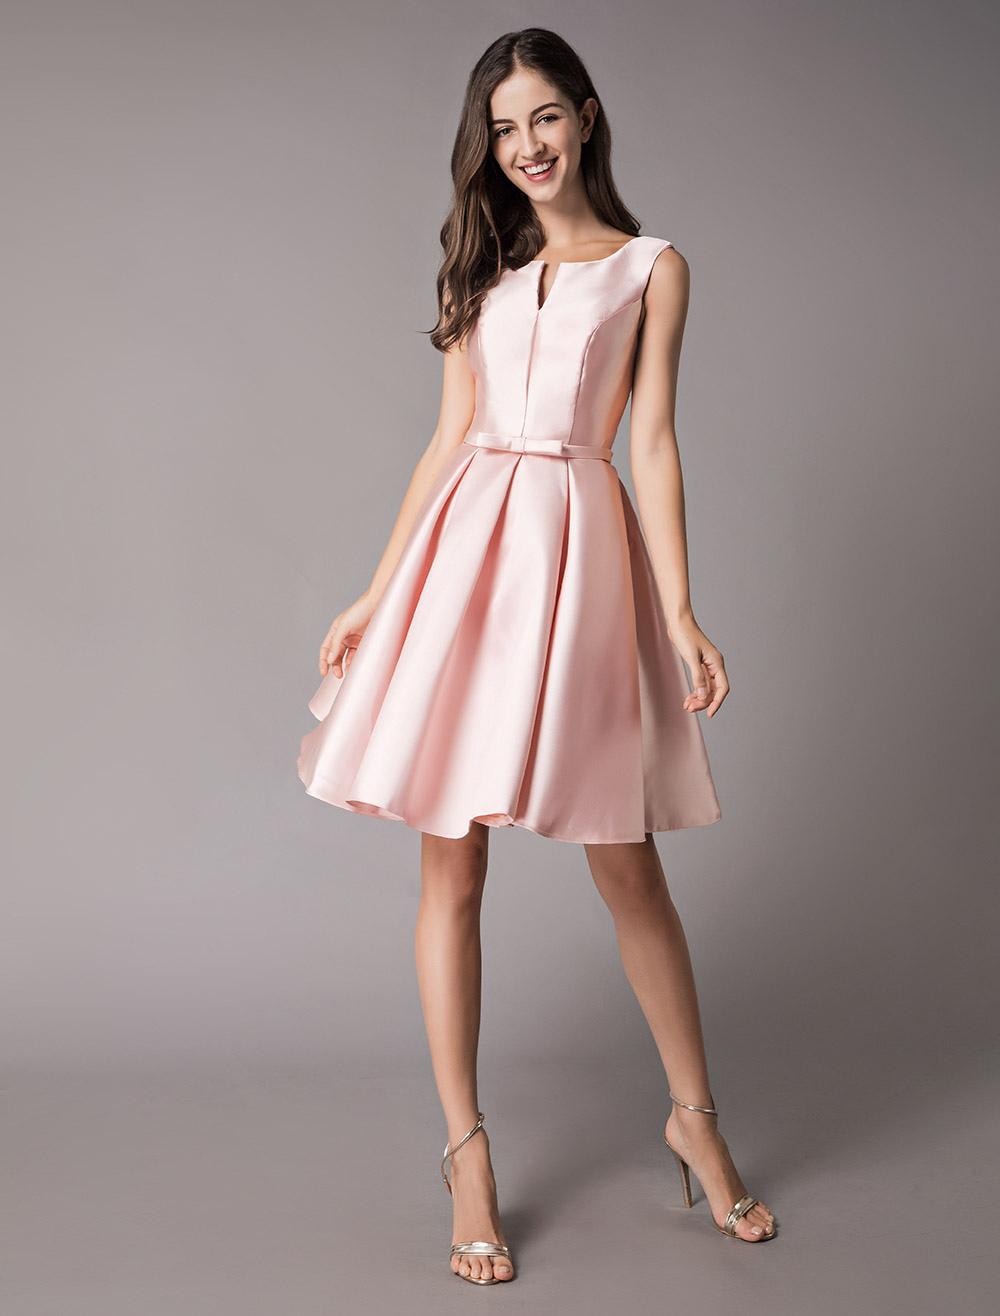 d972e630ecf4b9 ... Satin Cocktail Dresses Soft Pink A Line Sleeveless Short Prom Dress-No.3  ...